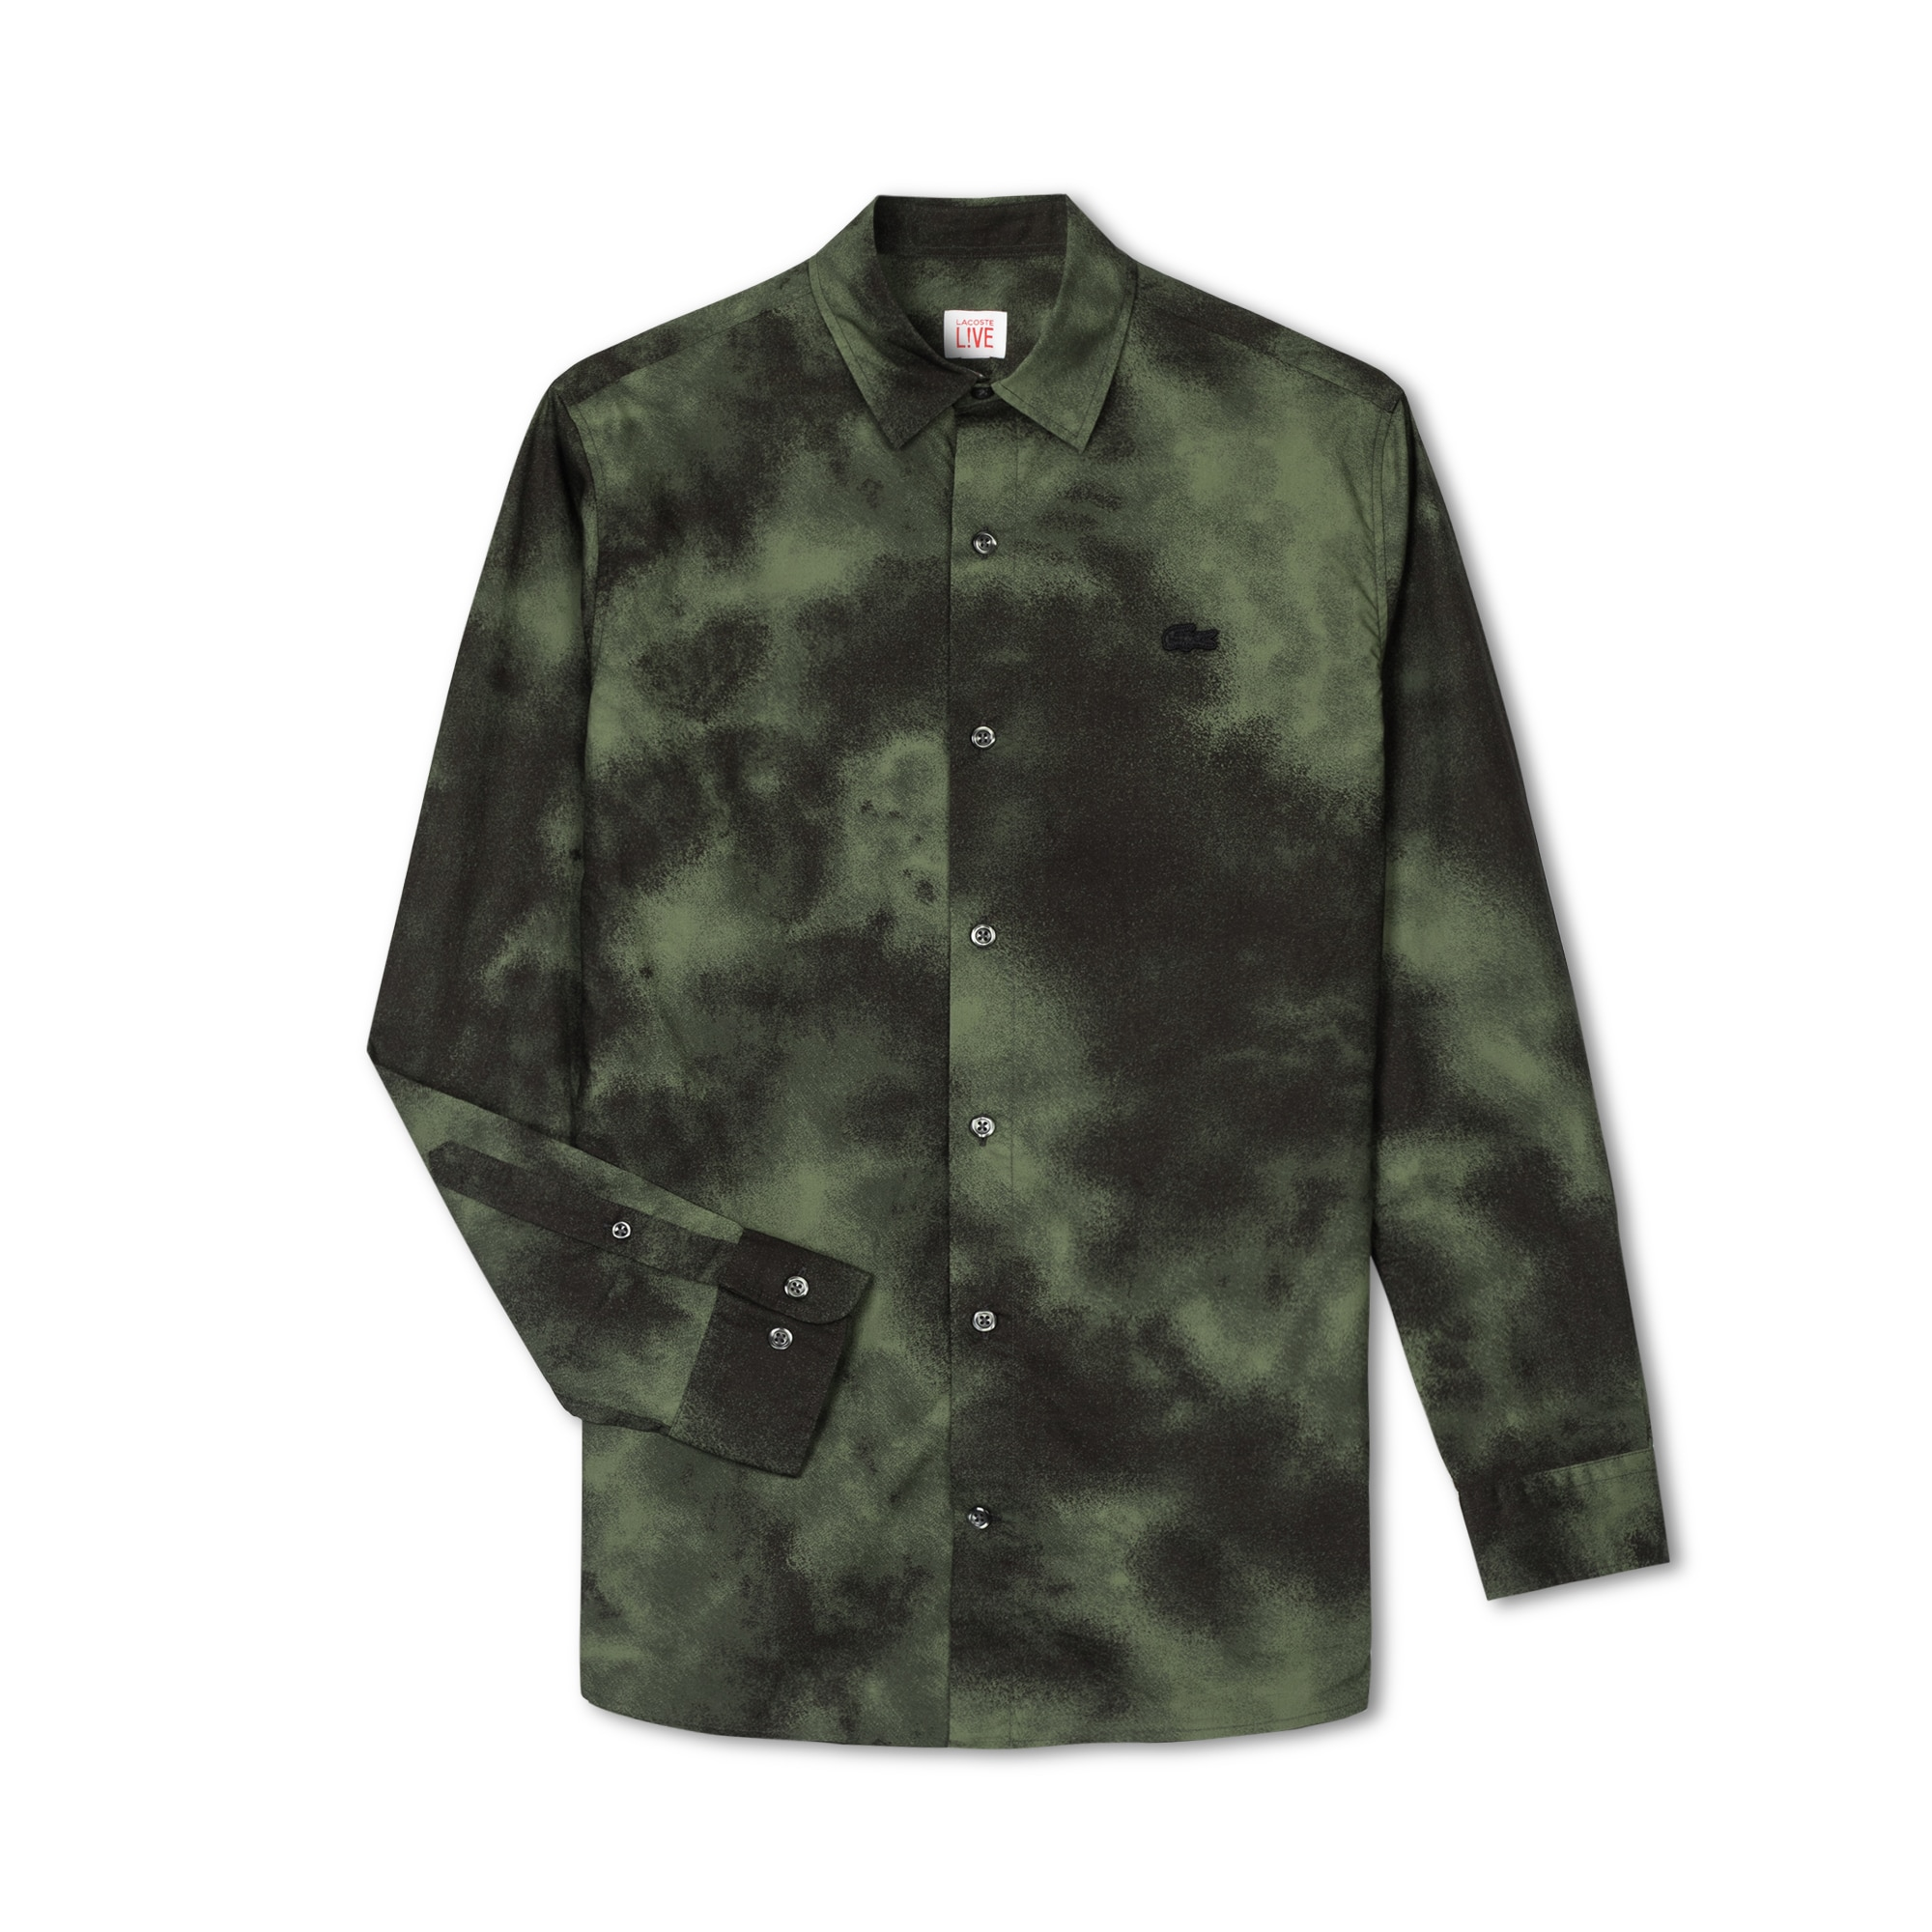 Lacoste L!VE系列男士时尚简约长袖衬衫